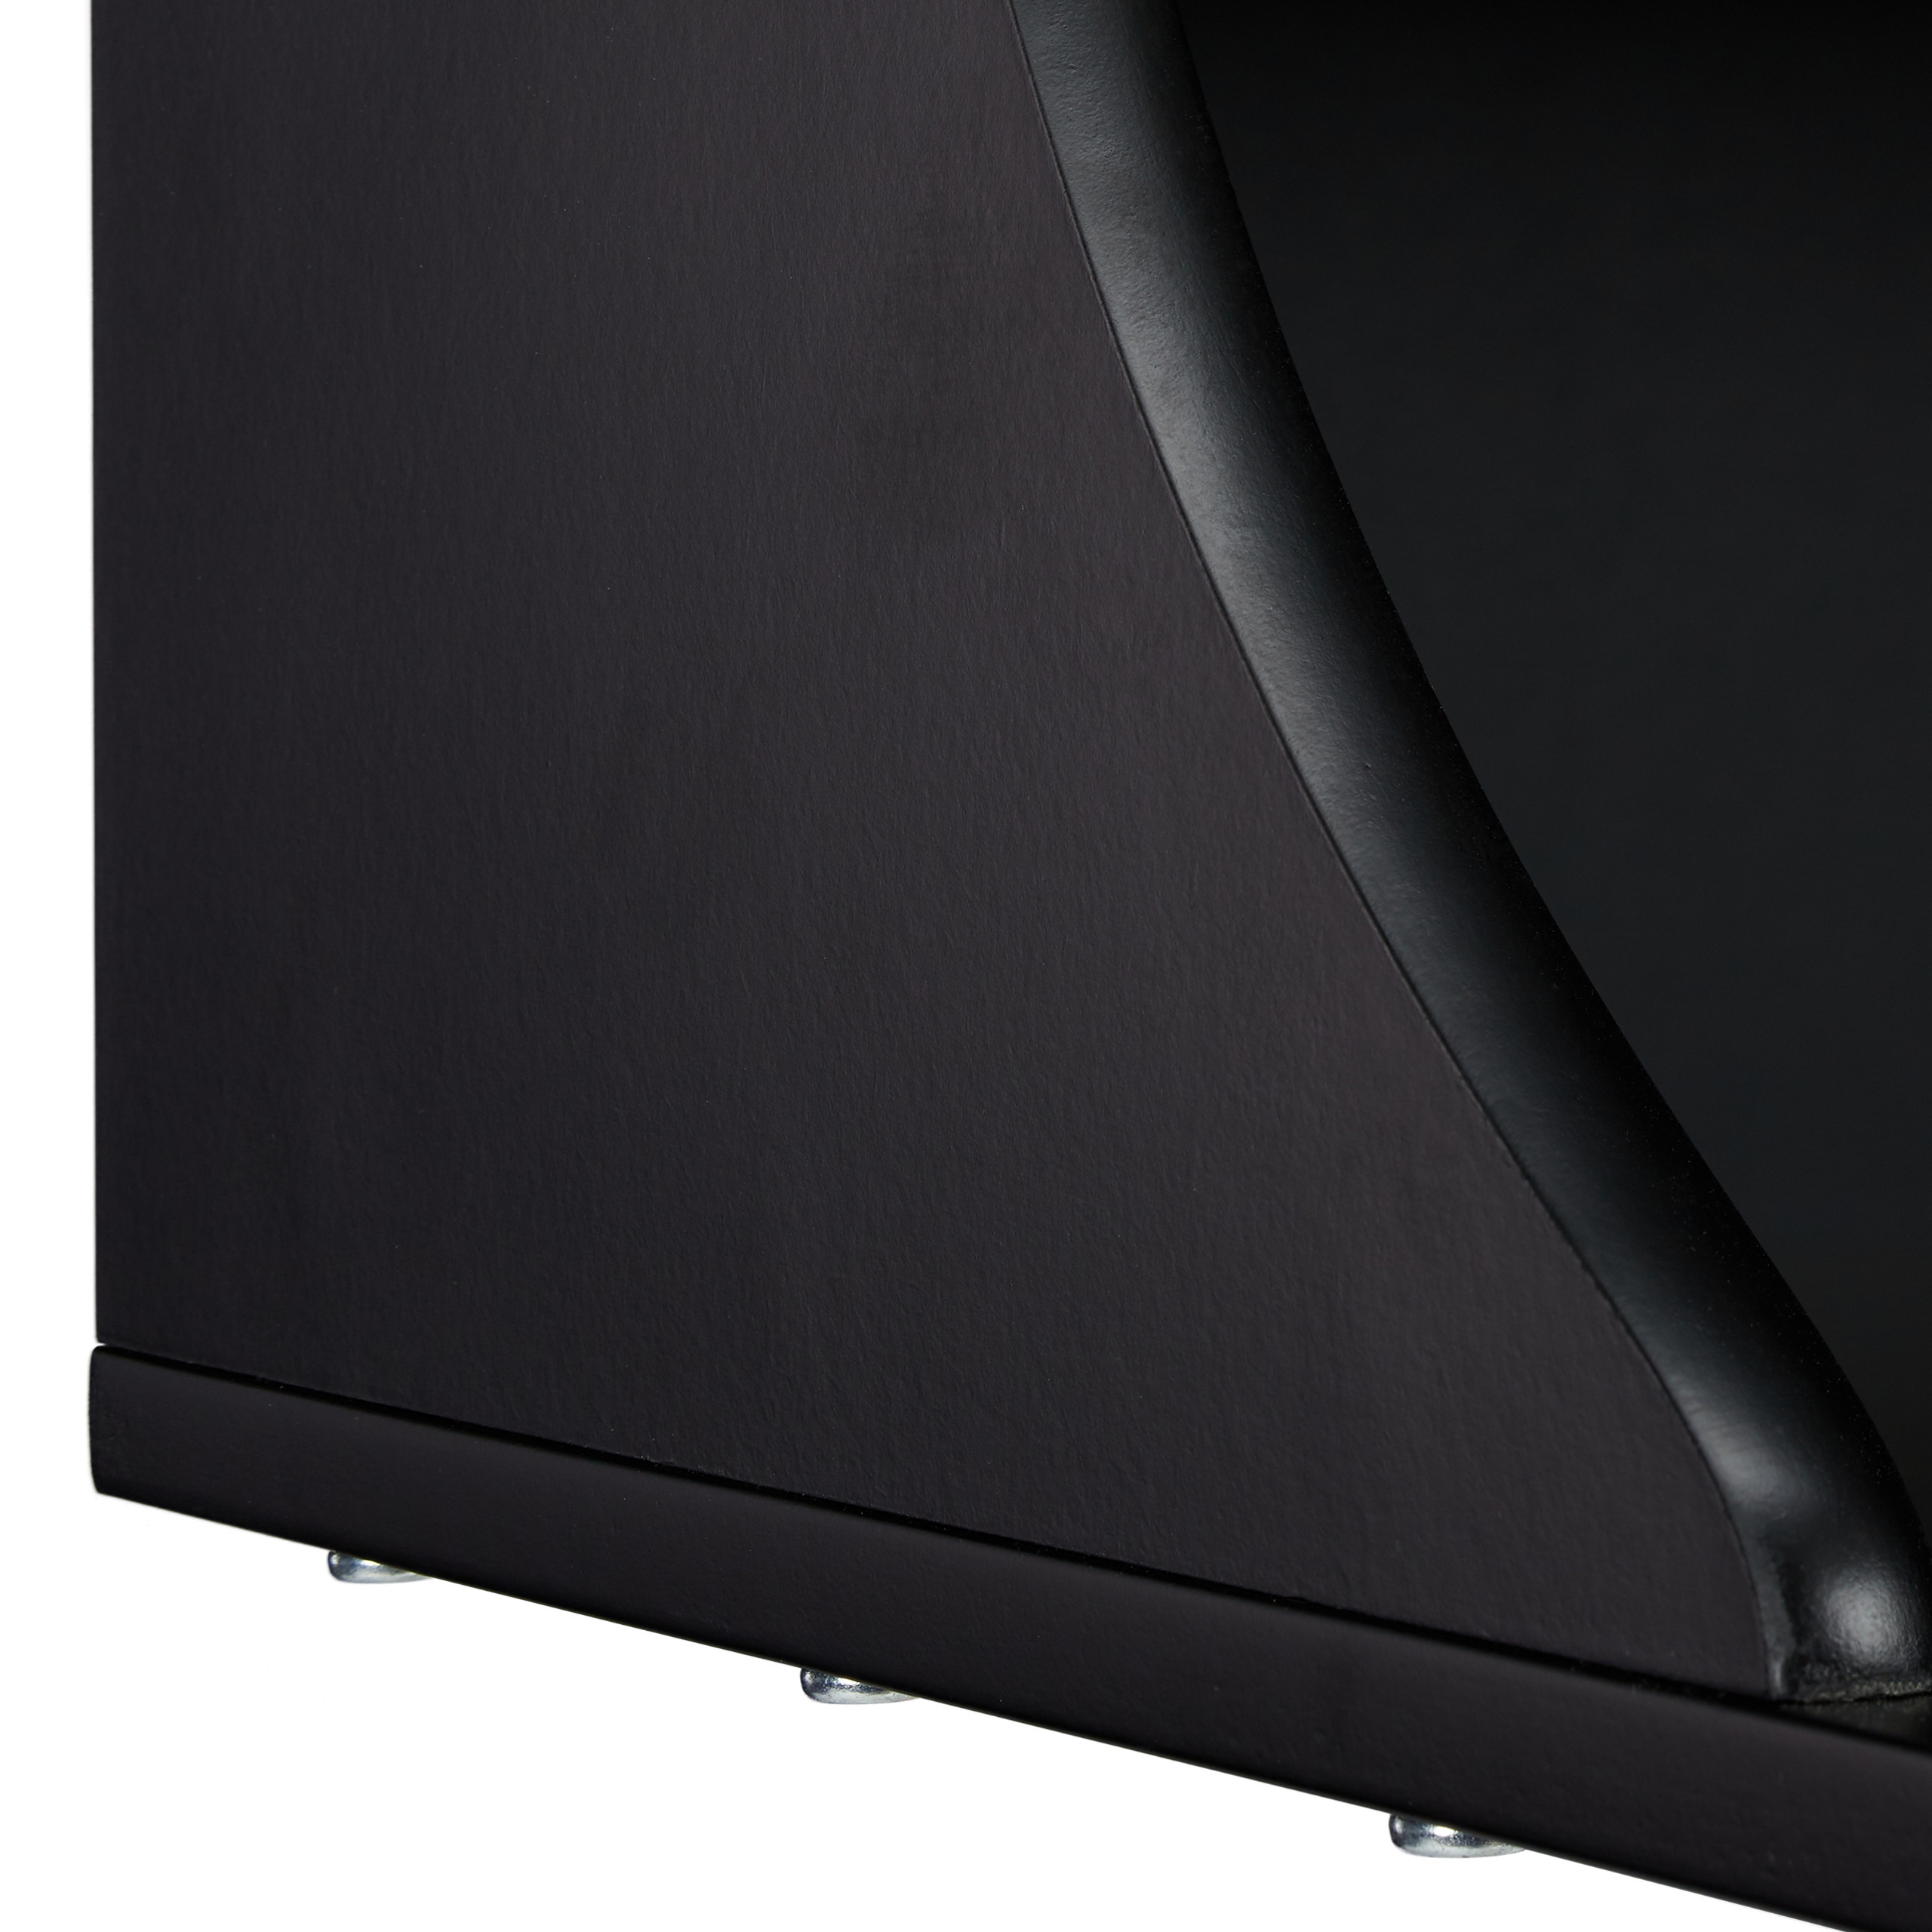 bureau-kinderbureau-ruimtebesparend-75-cm-hoog-laptoptafel-120-breed miniatuur 19